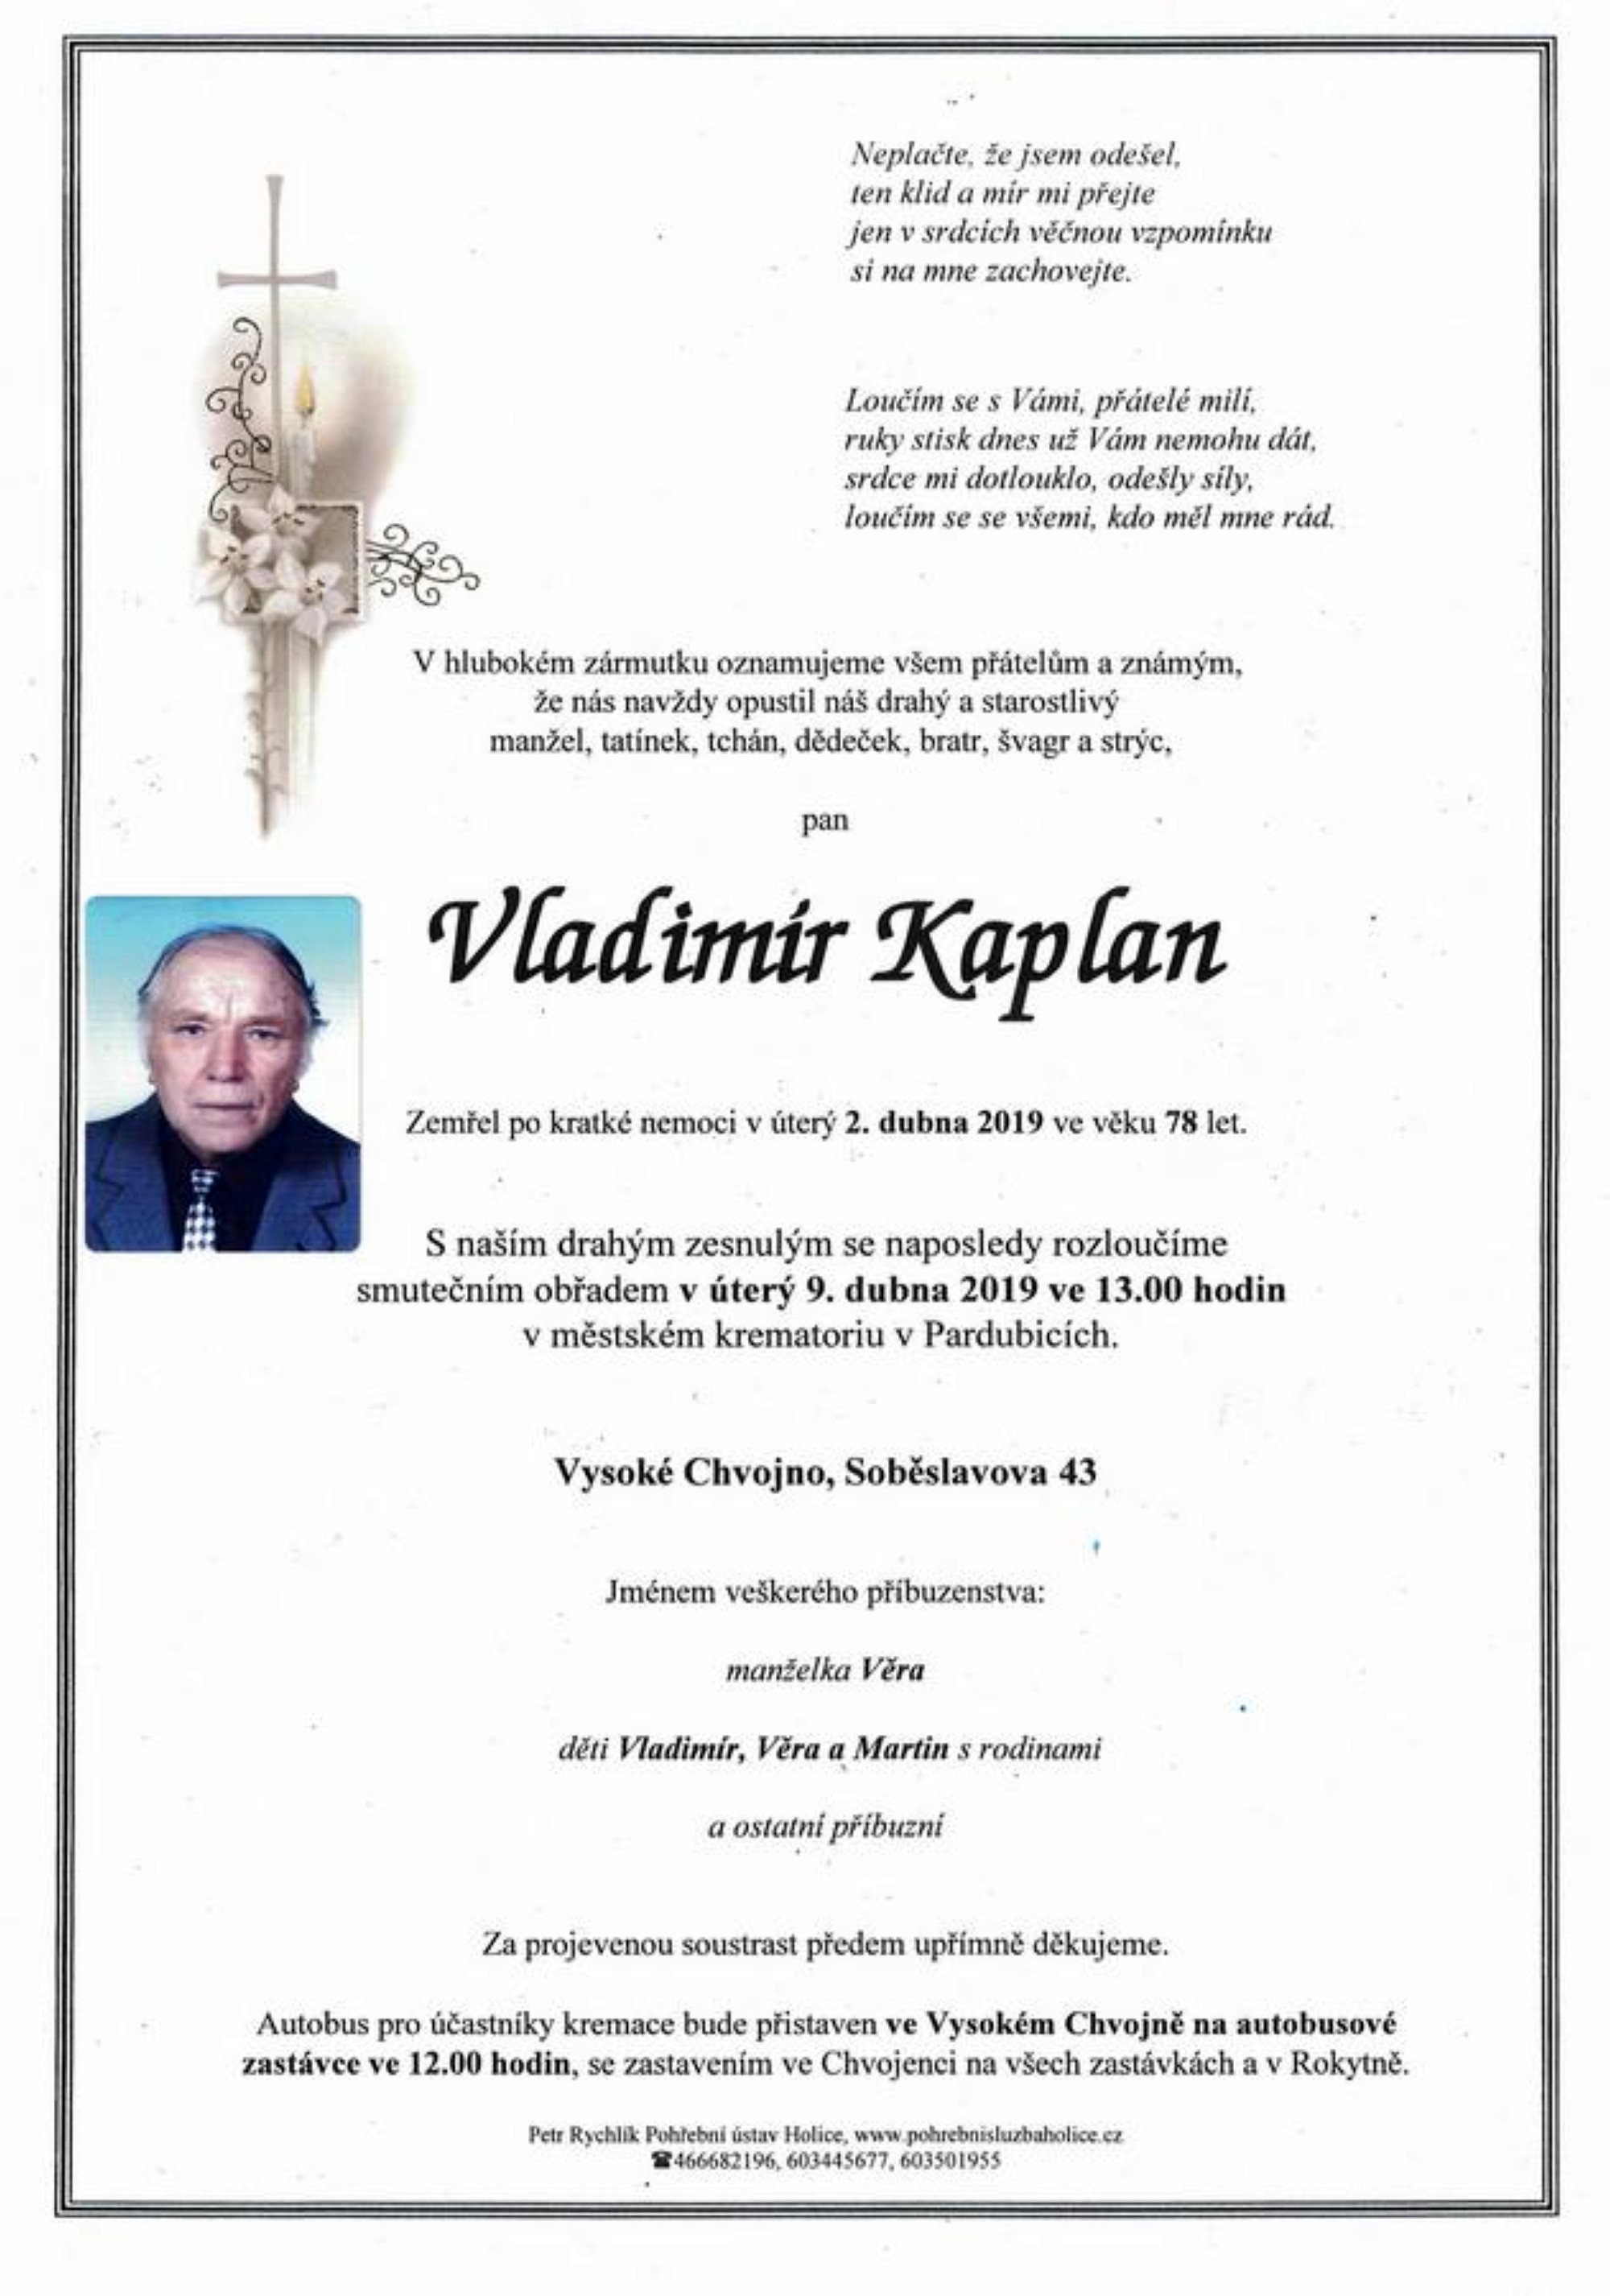 Vladimír Kaplan